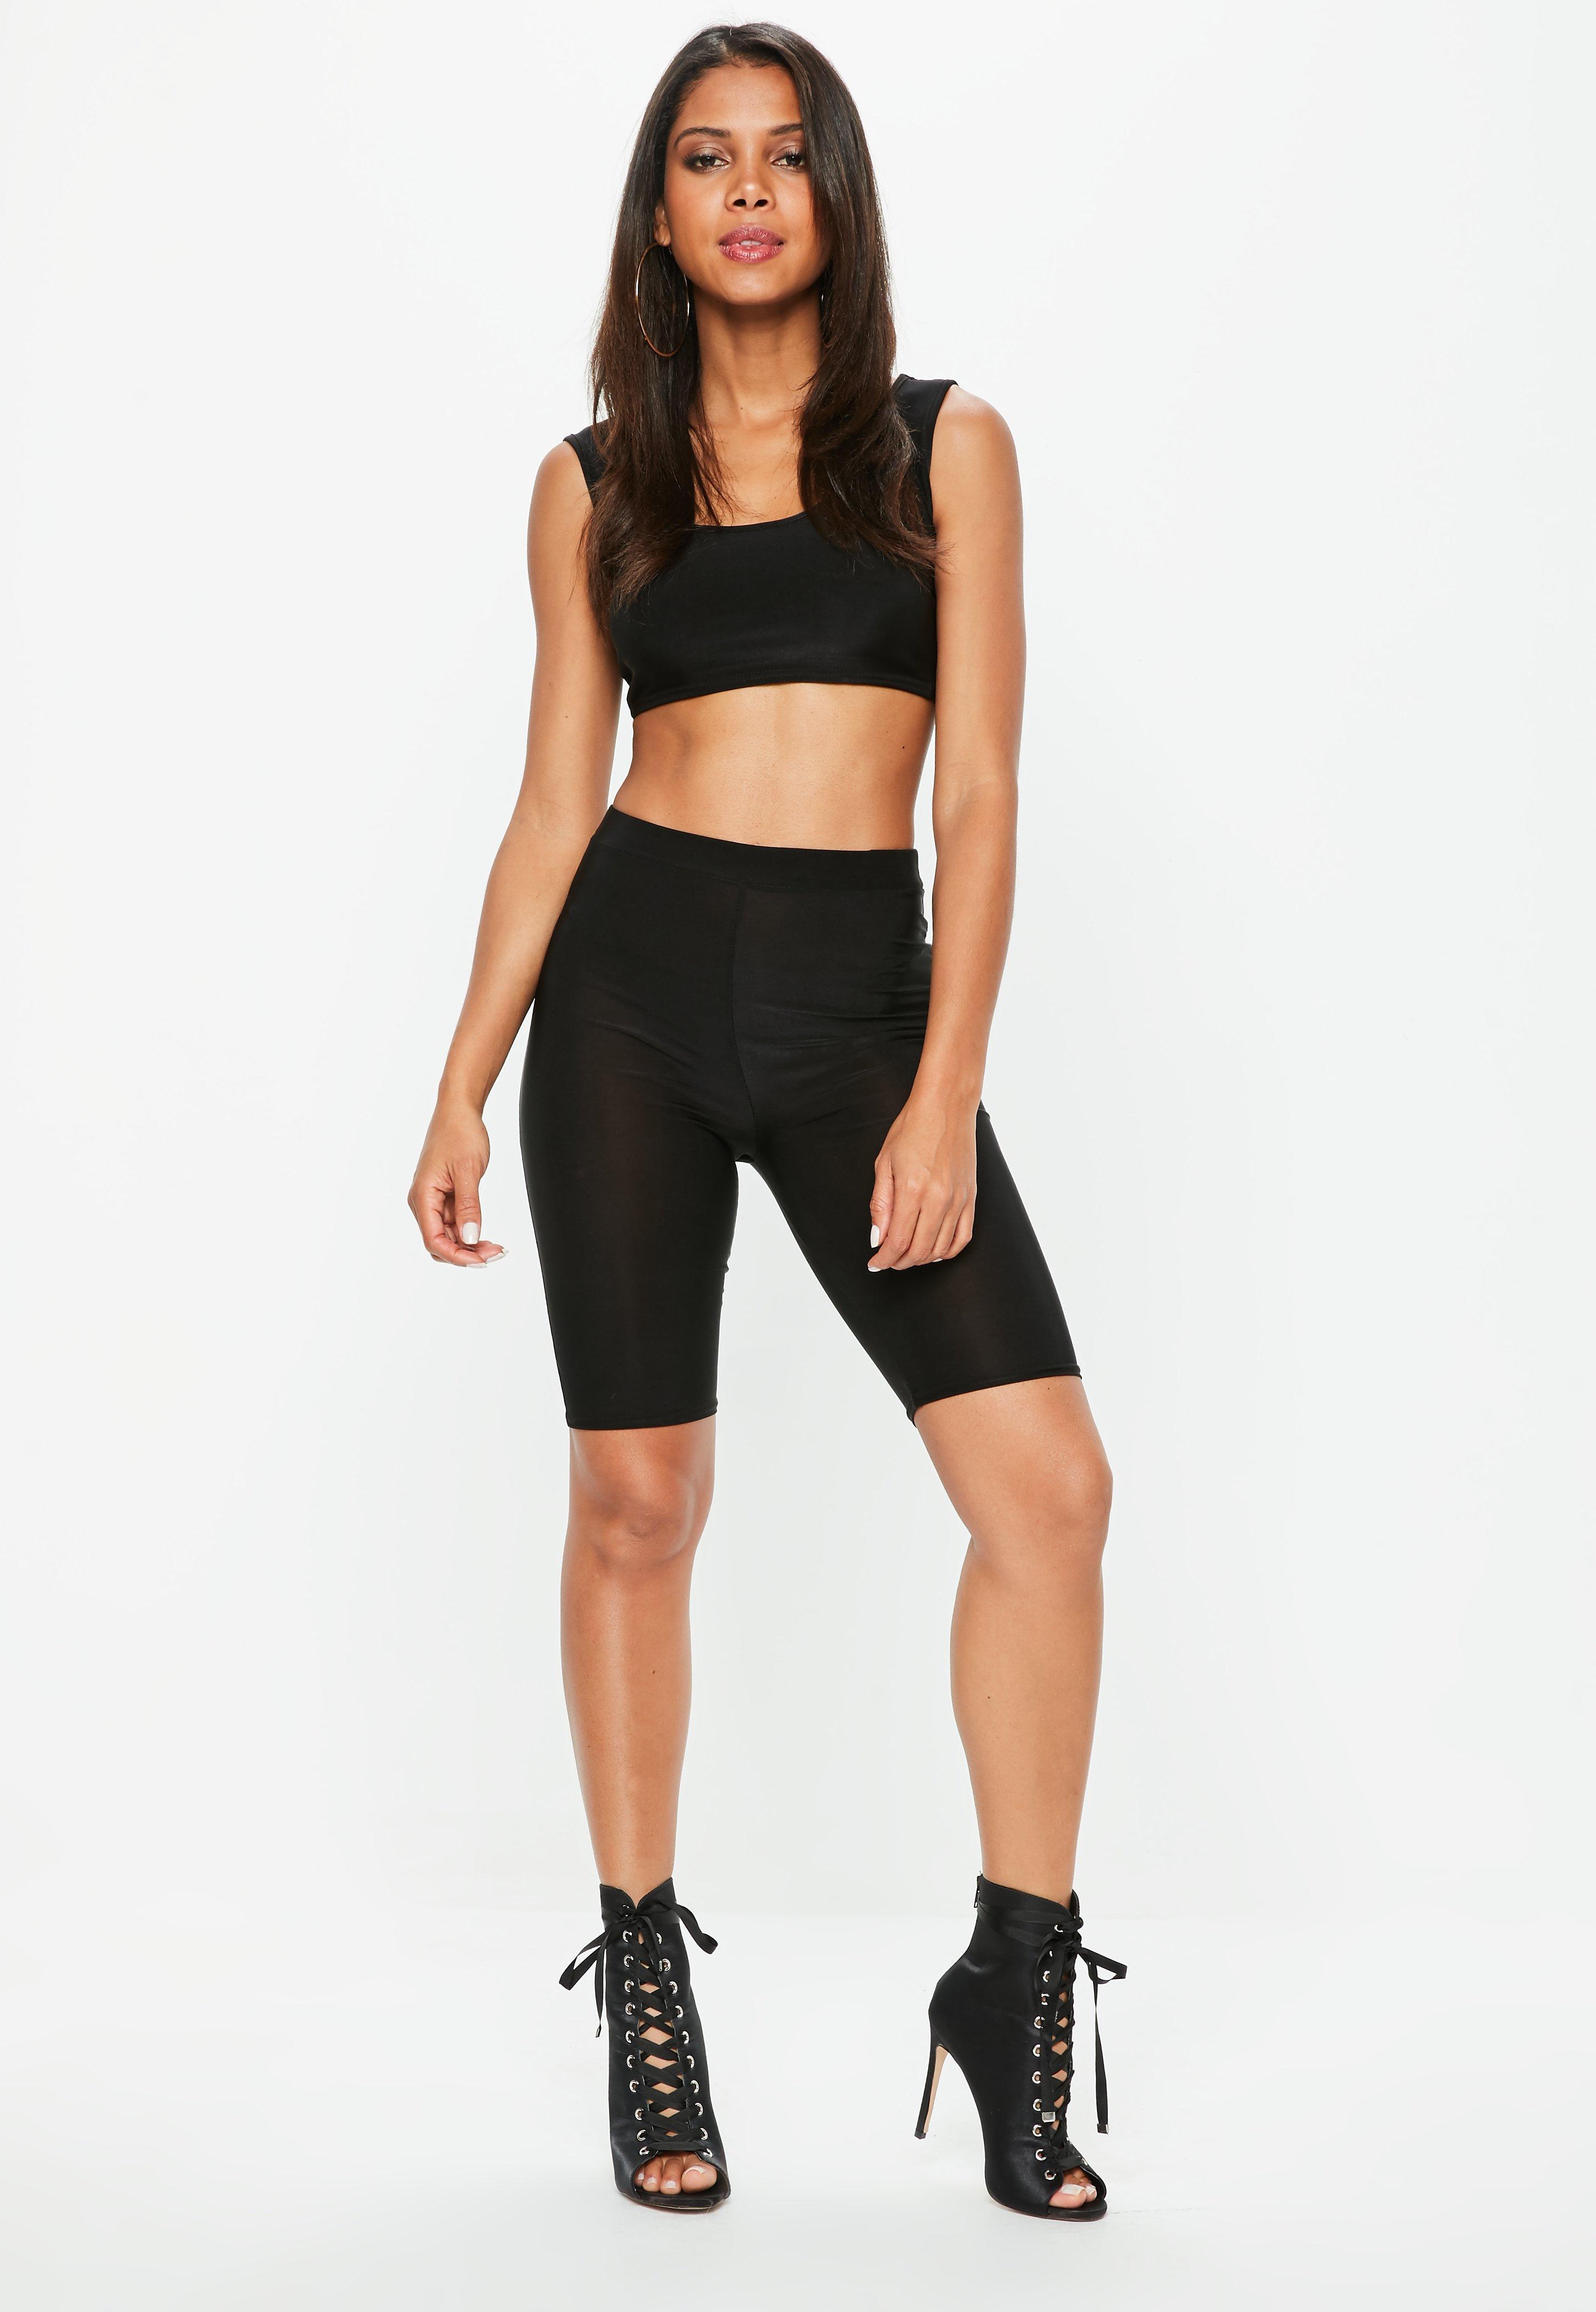 a50ae46232b70f Lyst - Missguided Black Disco Slinky Cycling Shorts in Black